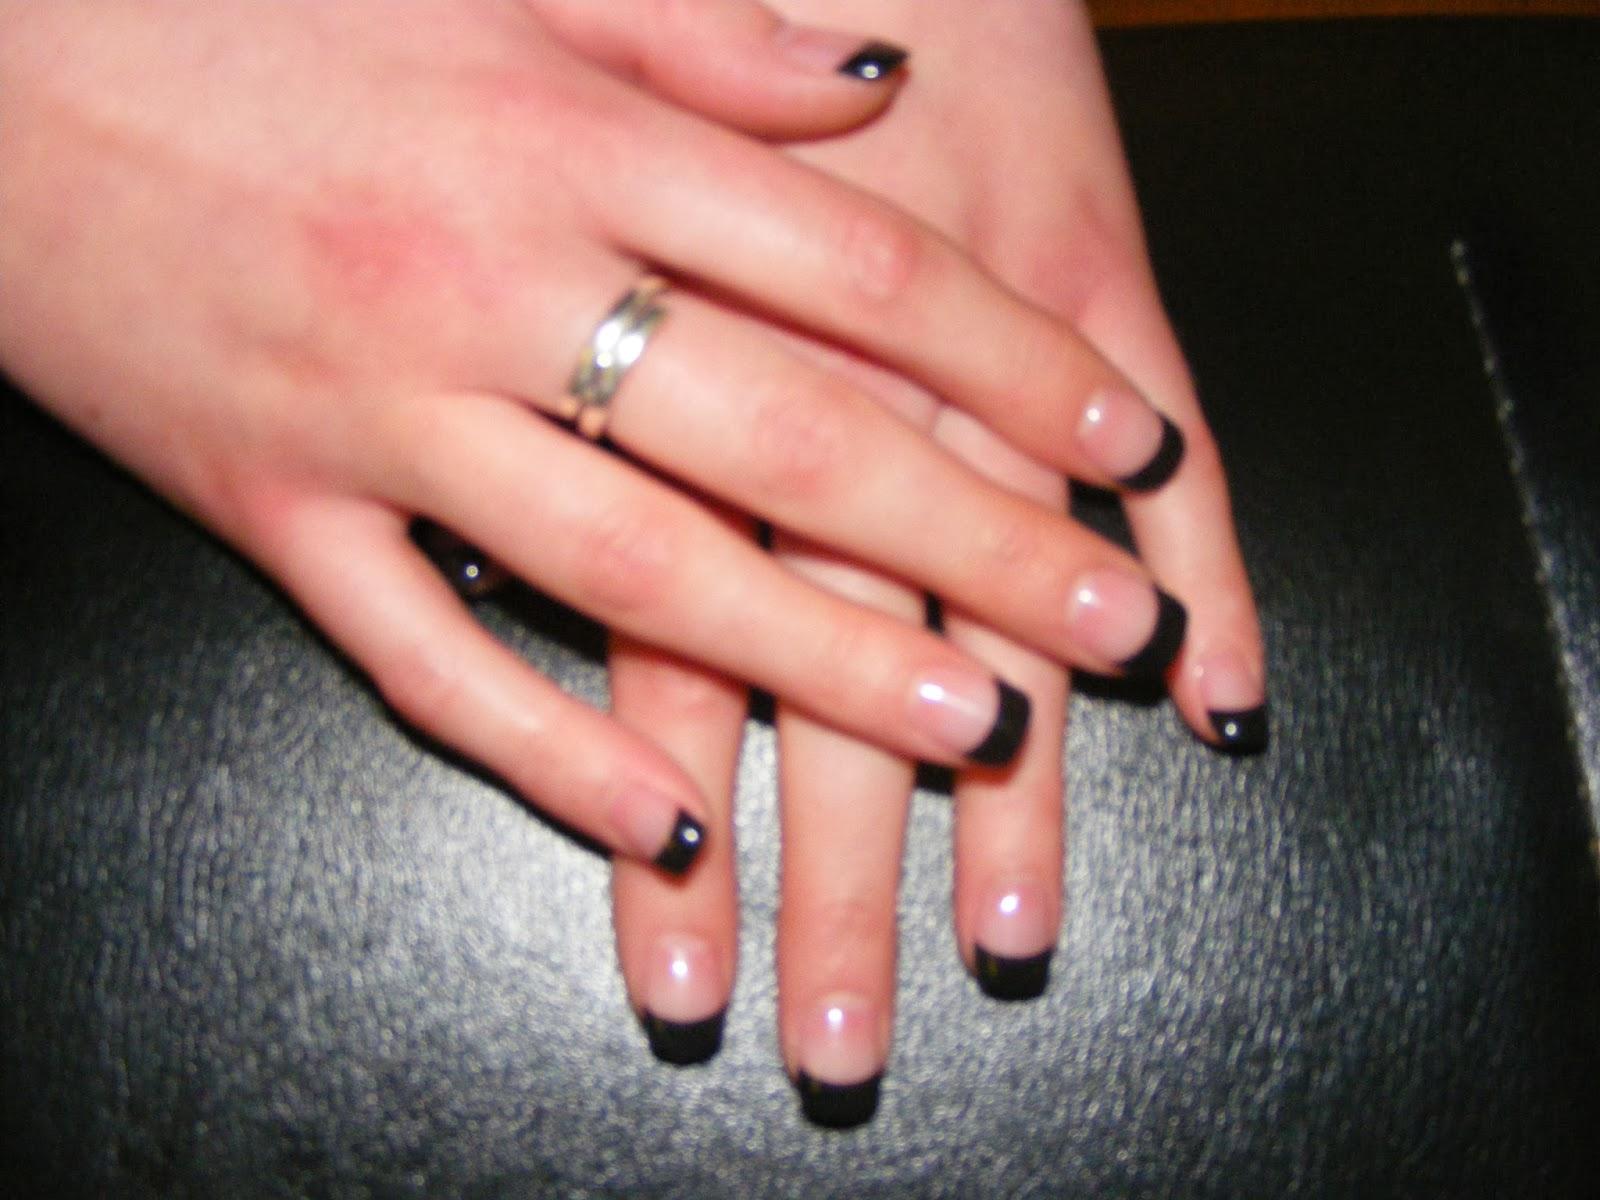 Kim 39 s nails salon acrylic gel nail extensions for Acrylic toenails salon